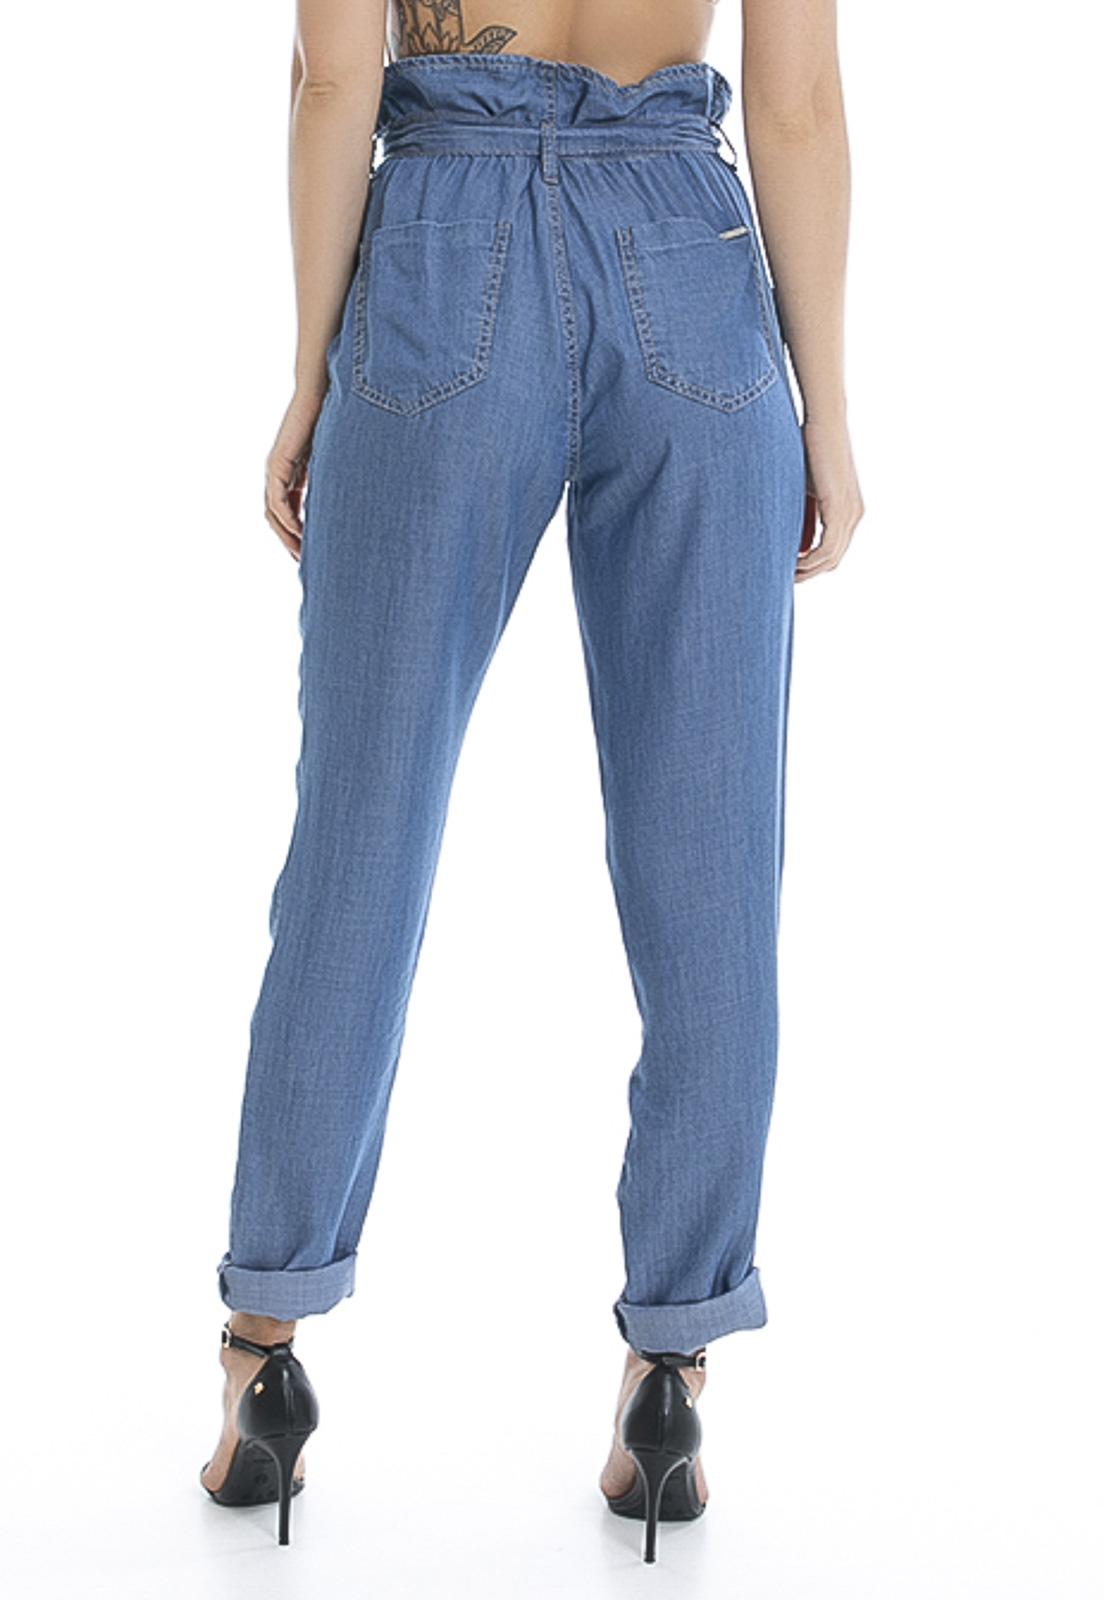 Calça Clochard Pkd Jeans